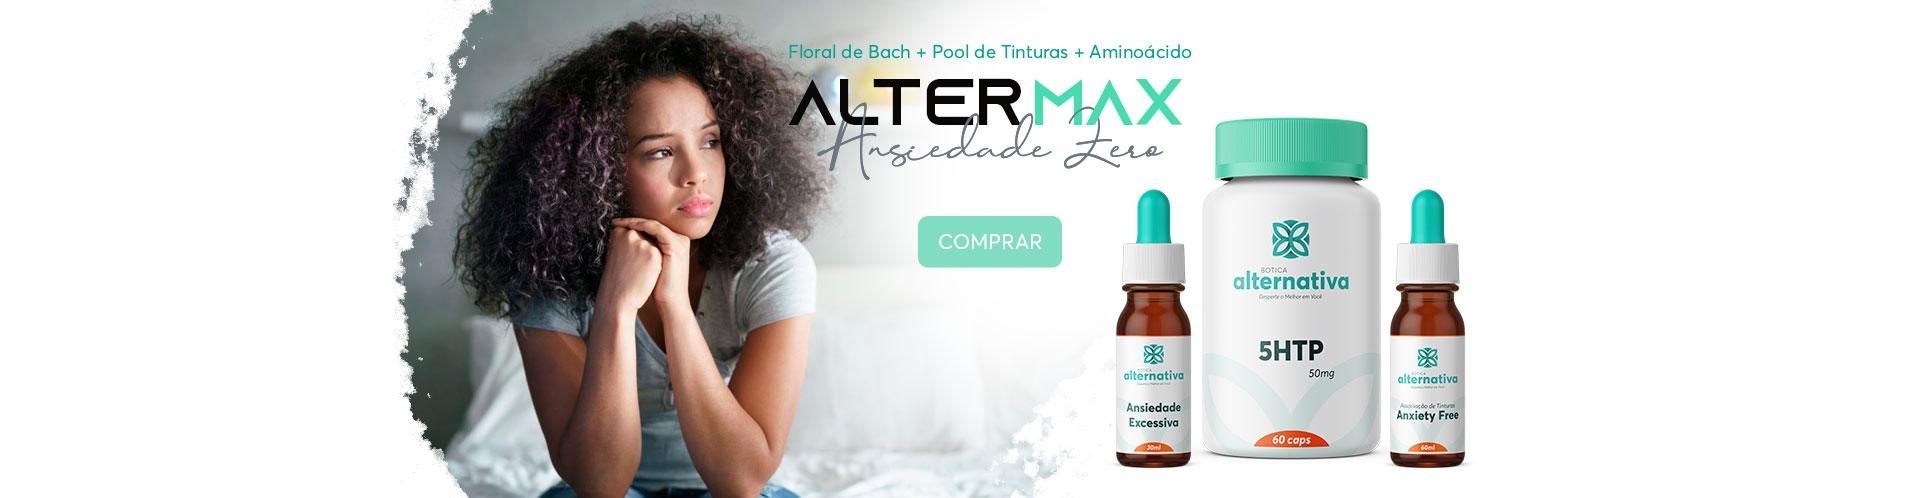 AlterMax Ansiedade Zero - 5HTP 50mg 60 cáps + Anxiety Free 60ml + Floral de Bach Ansiedade Excessiva 30ml